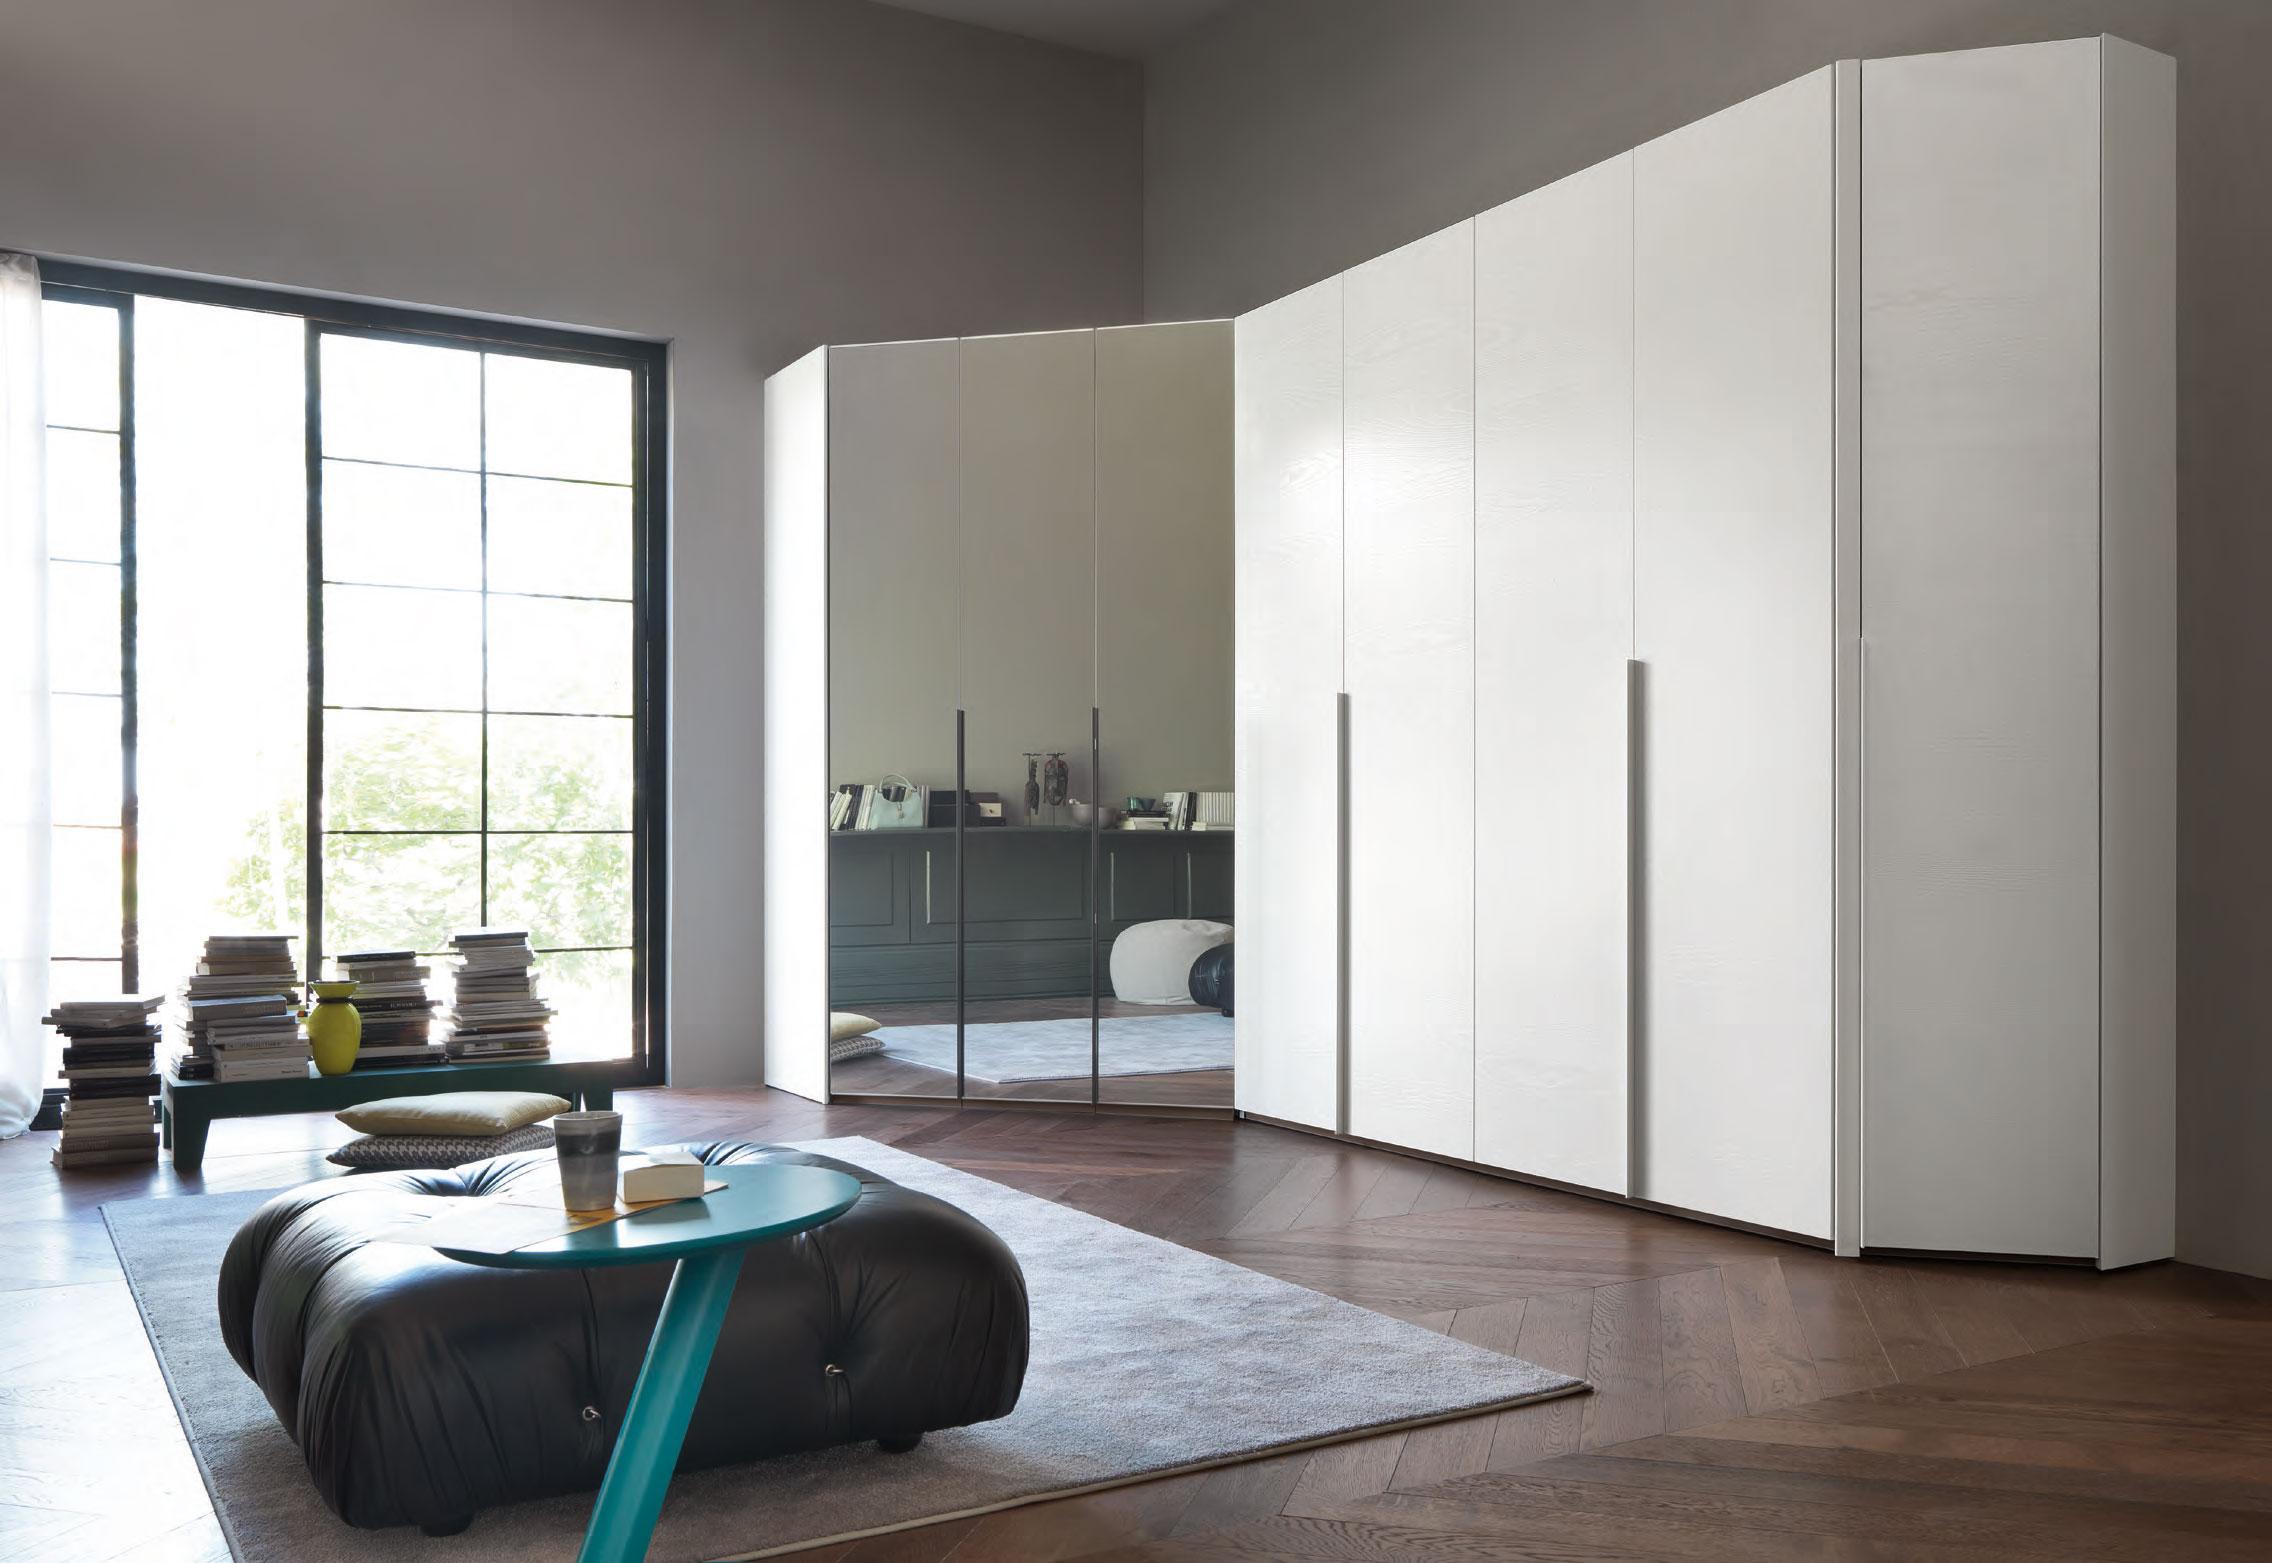 style sma modern bedroom wardrobes italy collections - style collections sma modern bedroom wardrobes